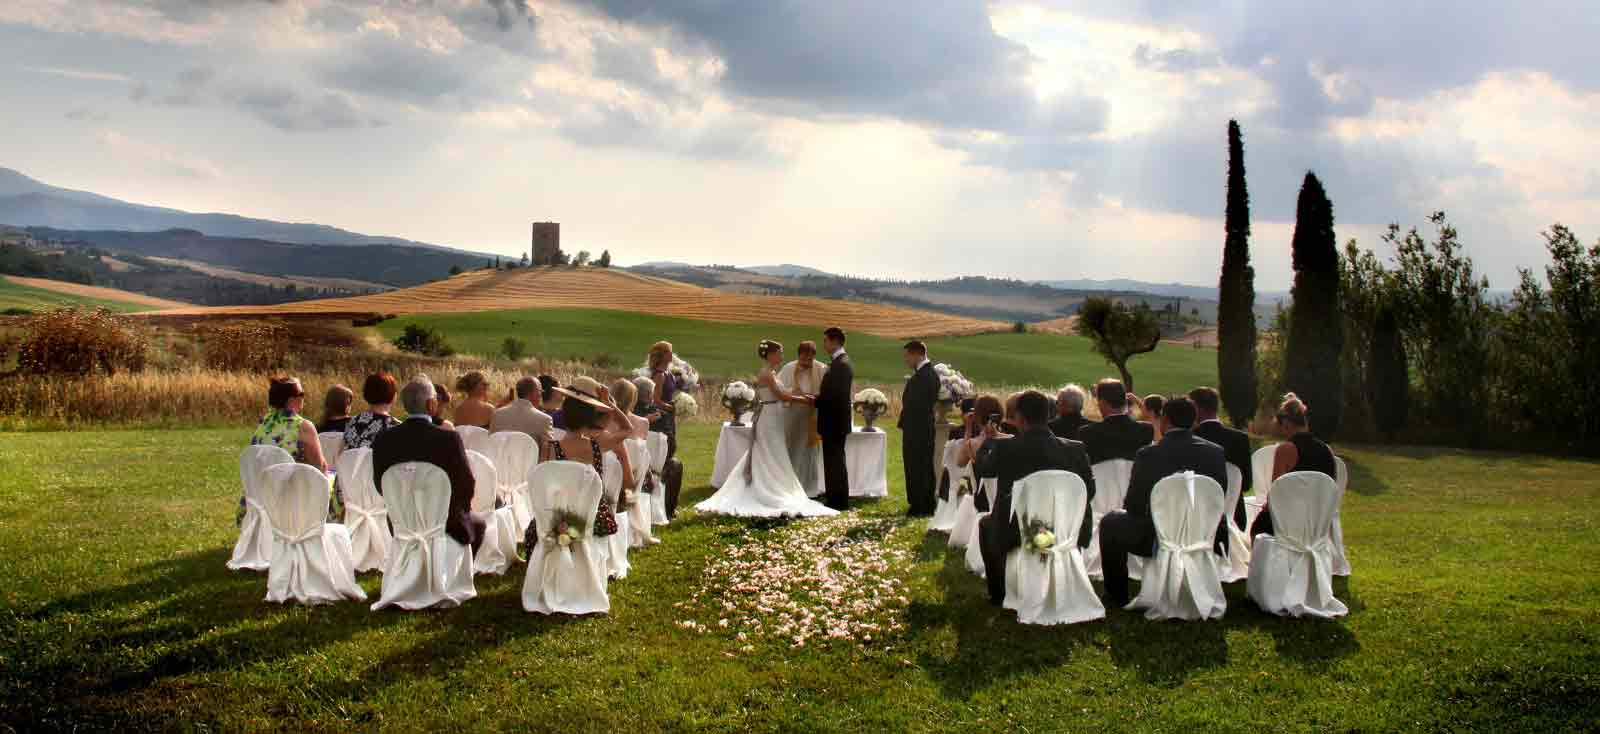 Outdoor wedding in italycivil religious and symbolic ceremonies junglespirit Image collections